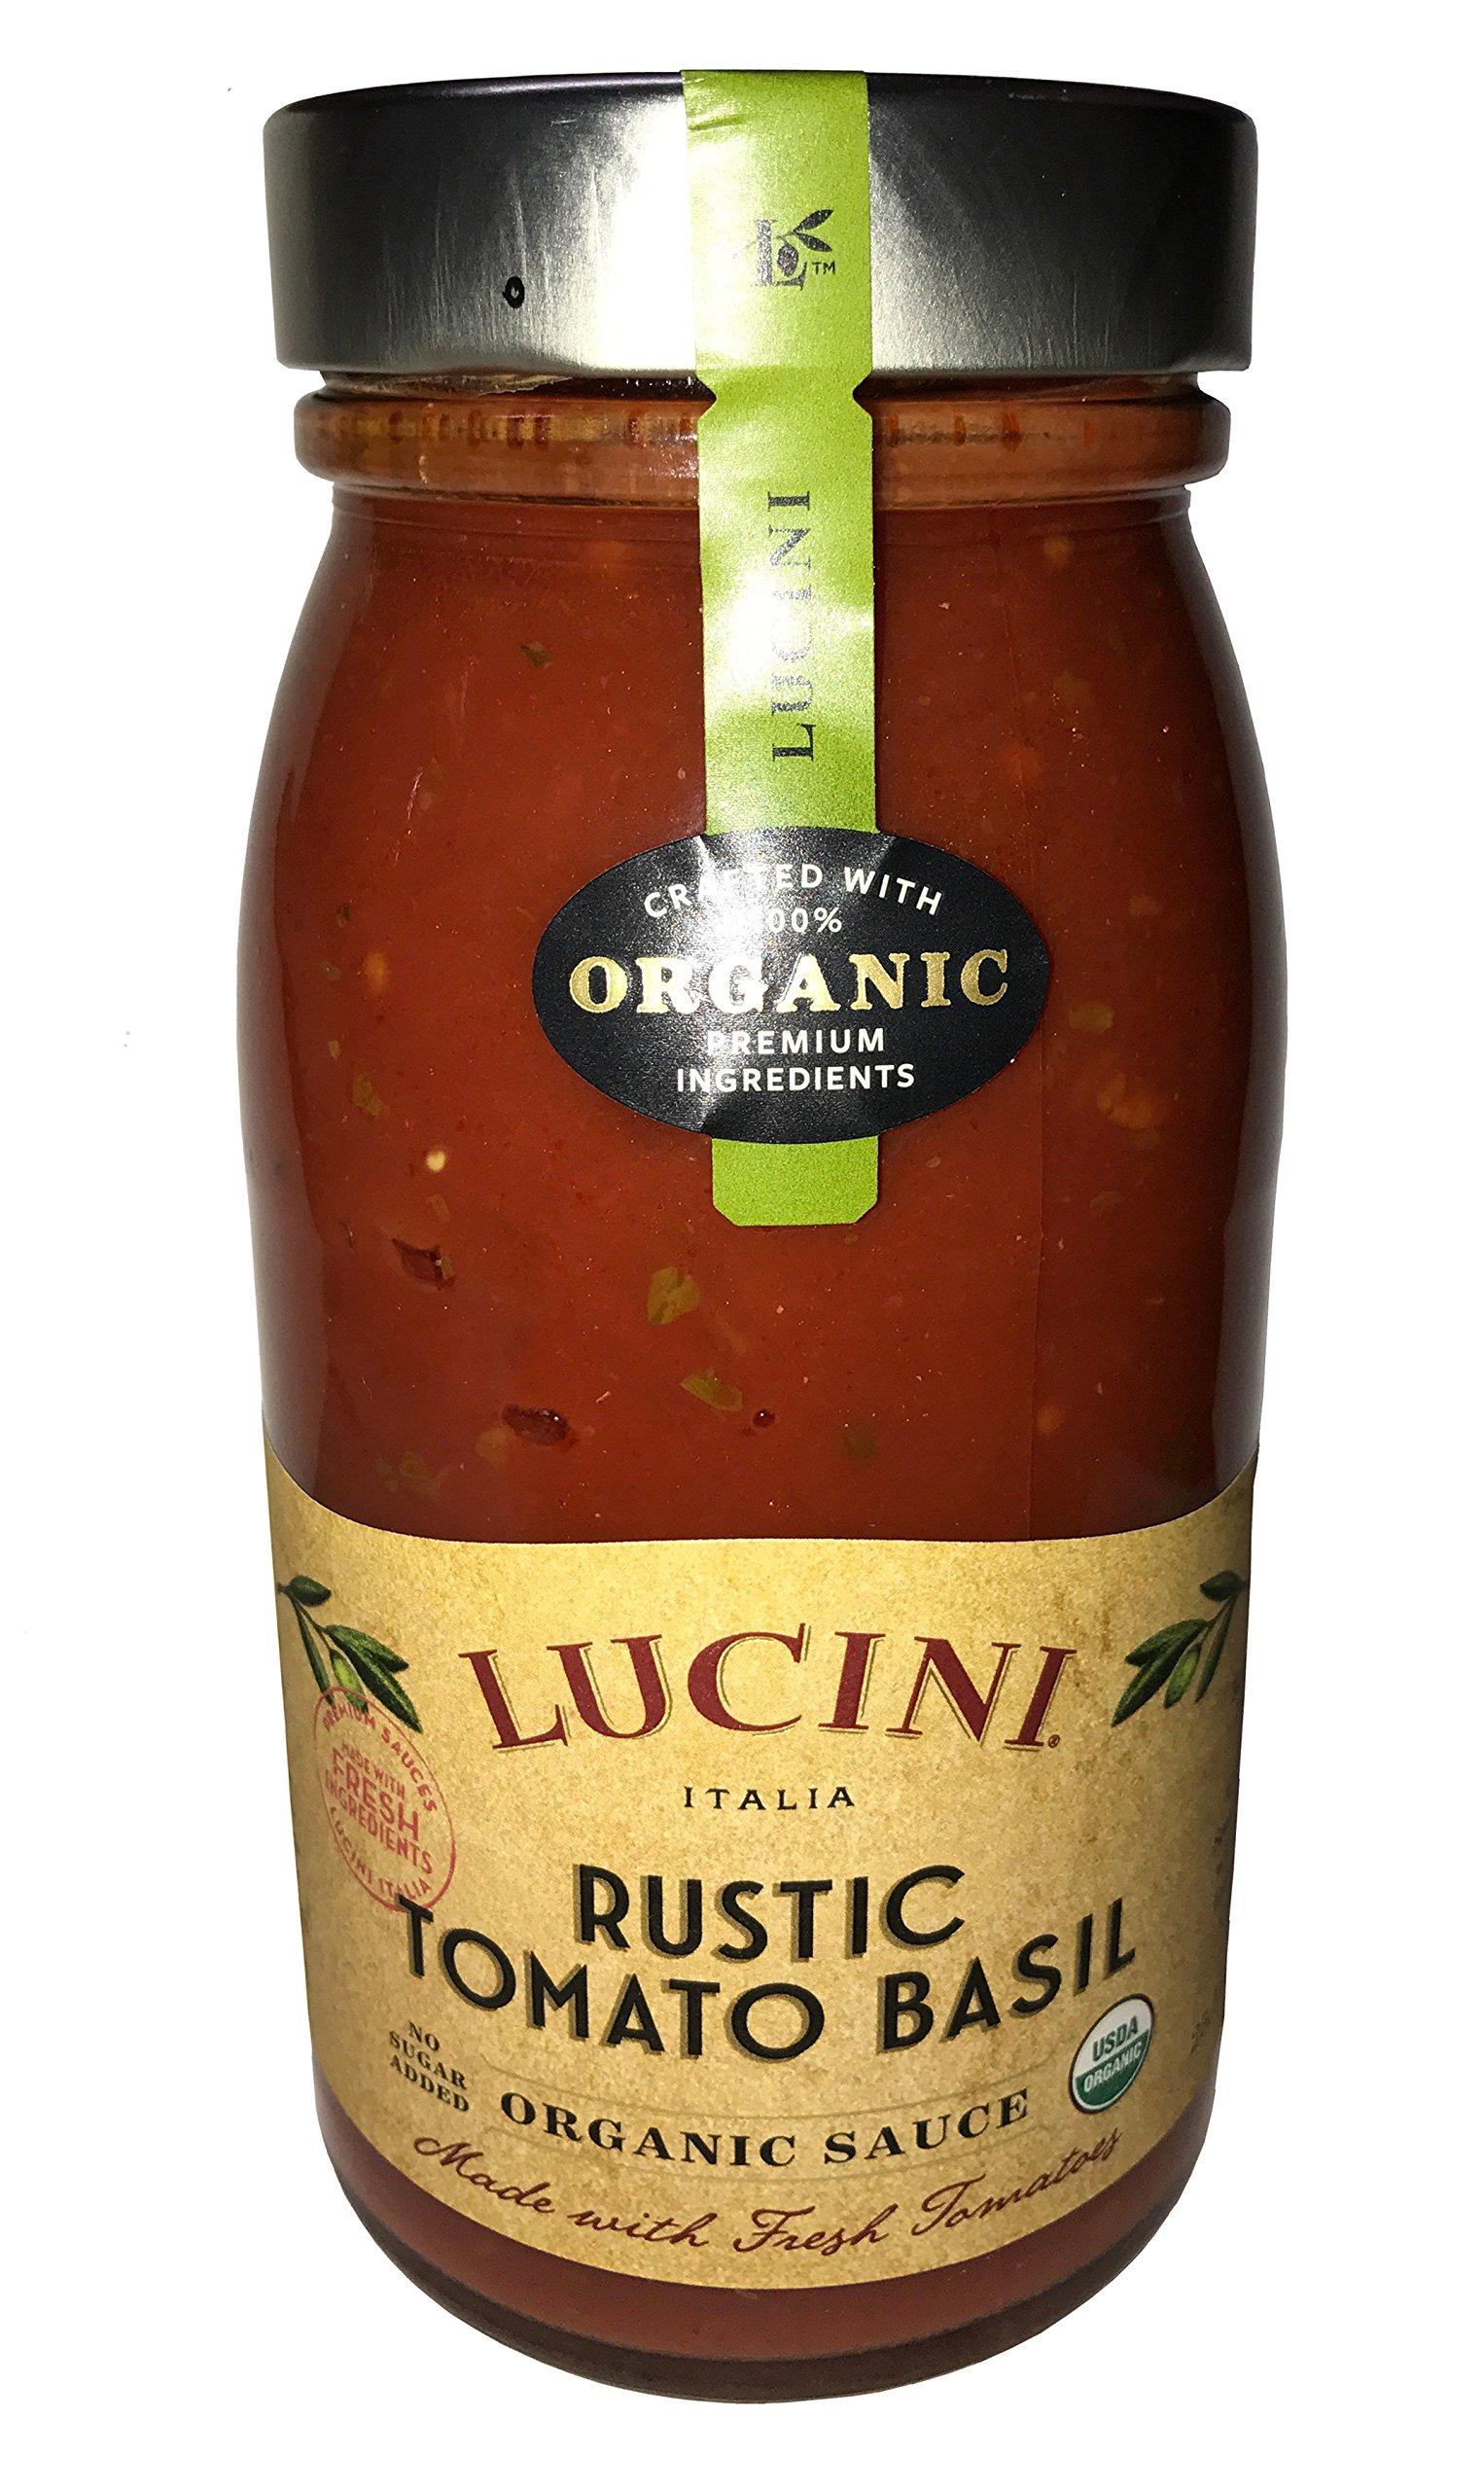 Lucini Italia USDA Certified Organic Rustic Tomato Basil 25.5 oz. (4 Pack)